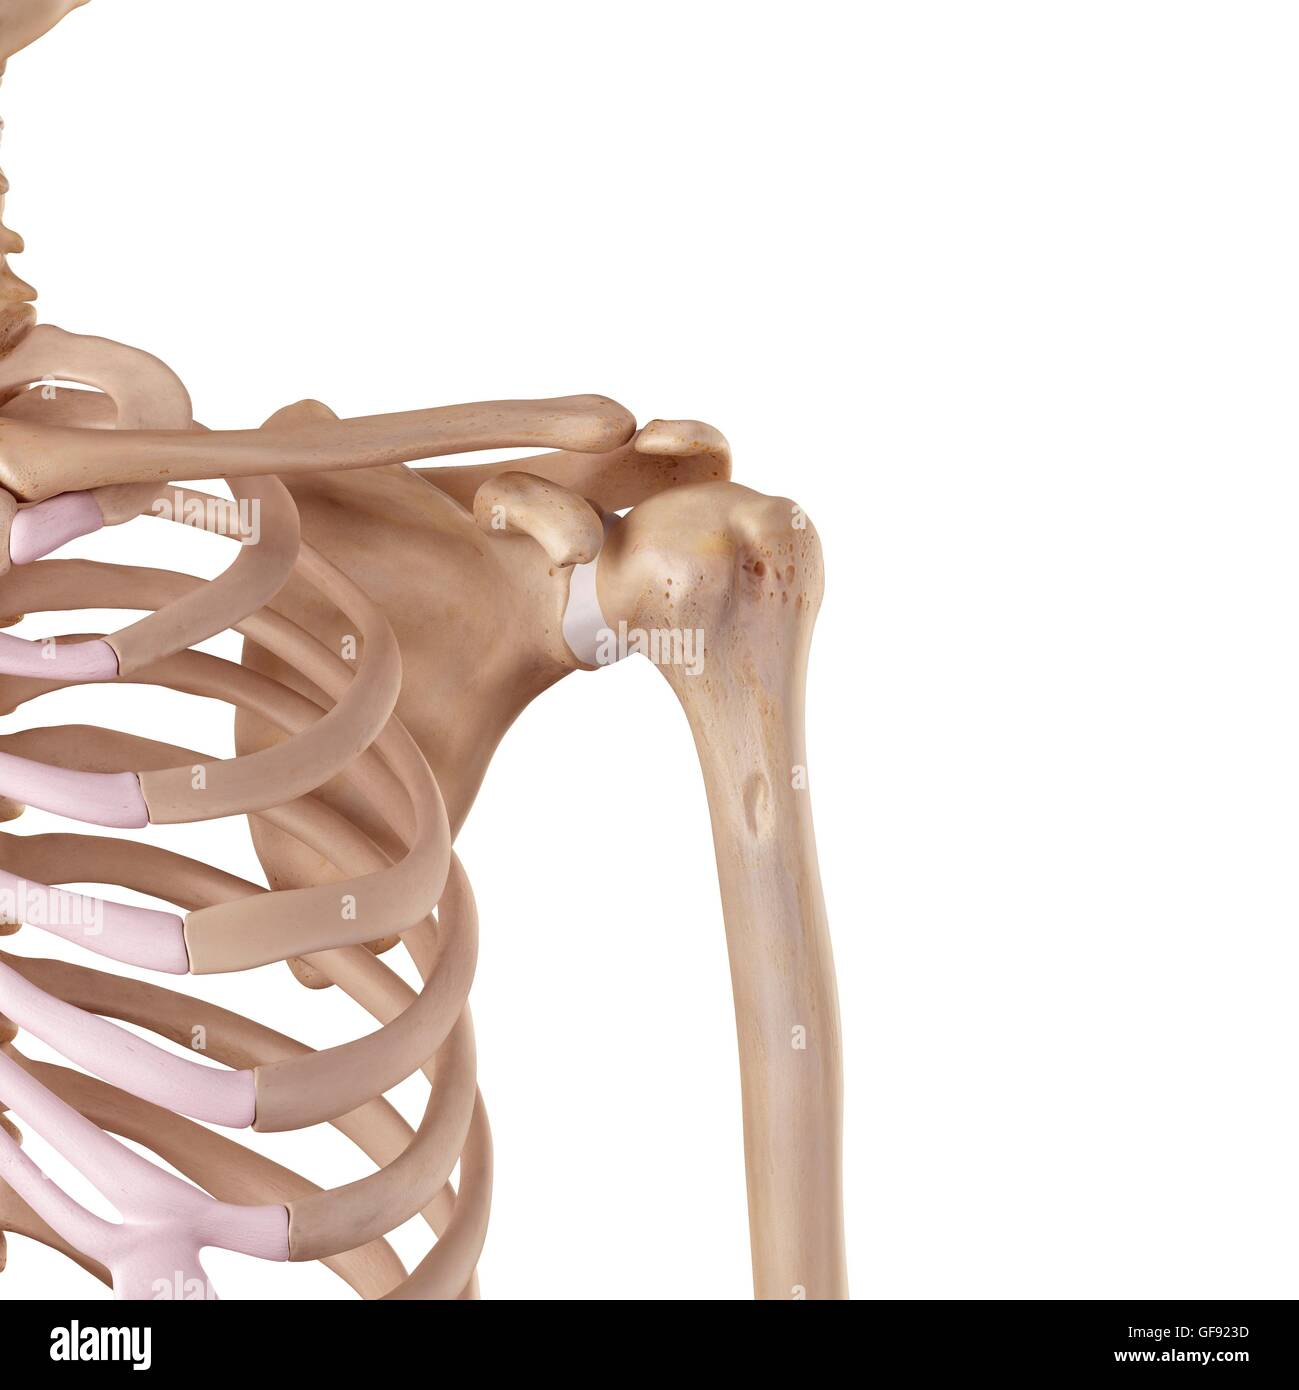 Beste Oberflächenanatomie Schulter Ideen - Anatomie Ideen - finotti.info